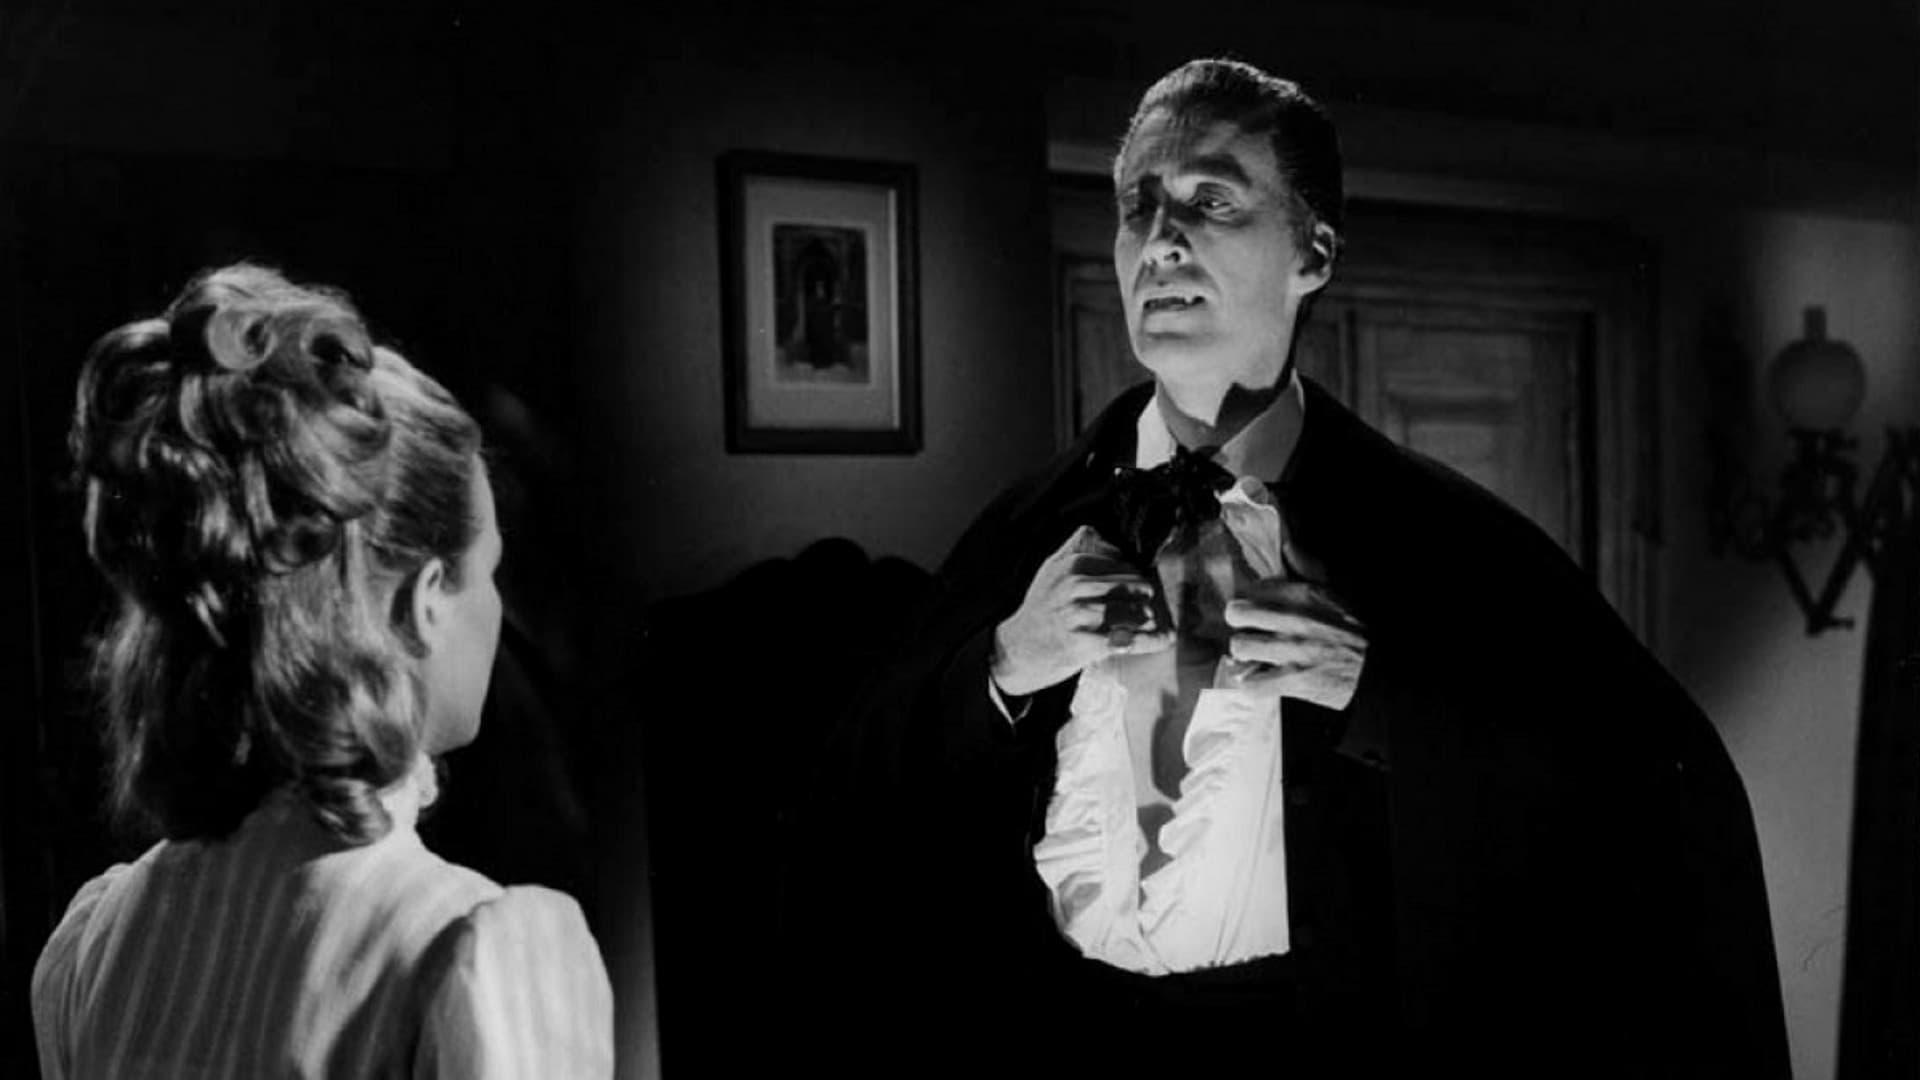 Regarder Dracula, prince des ténèbres en streaming gratuit